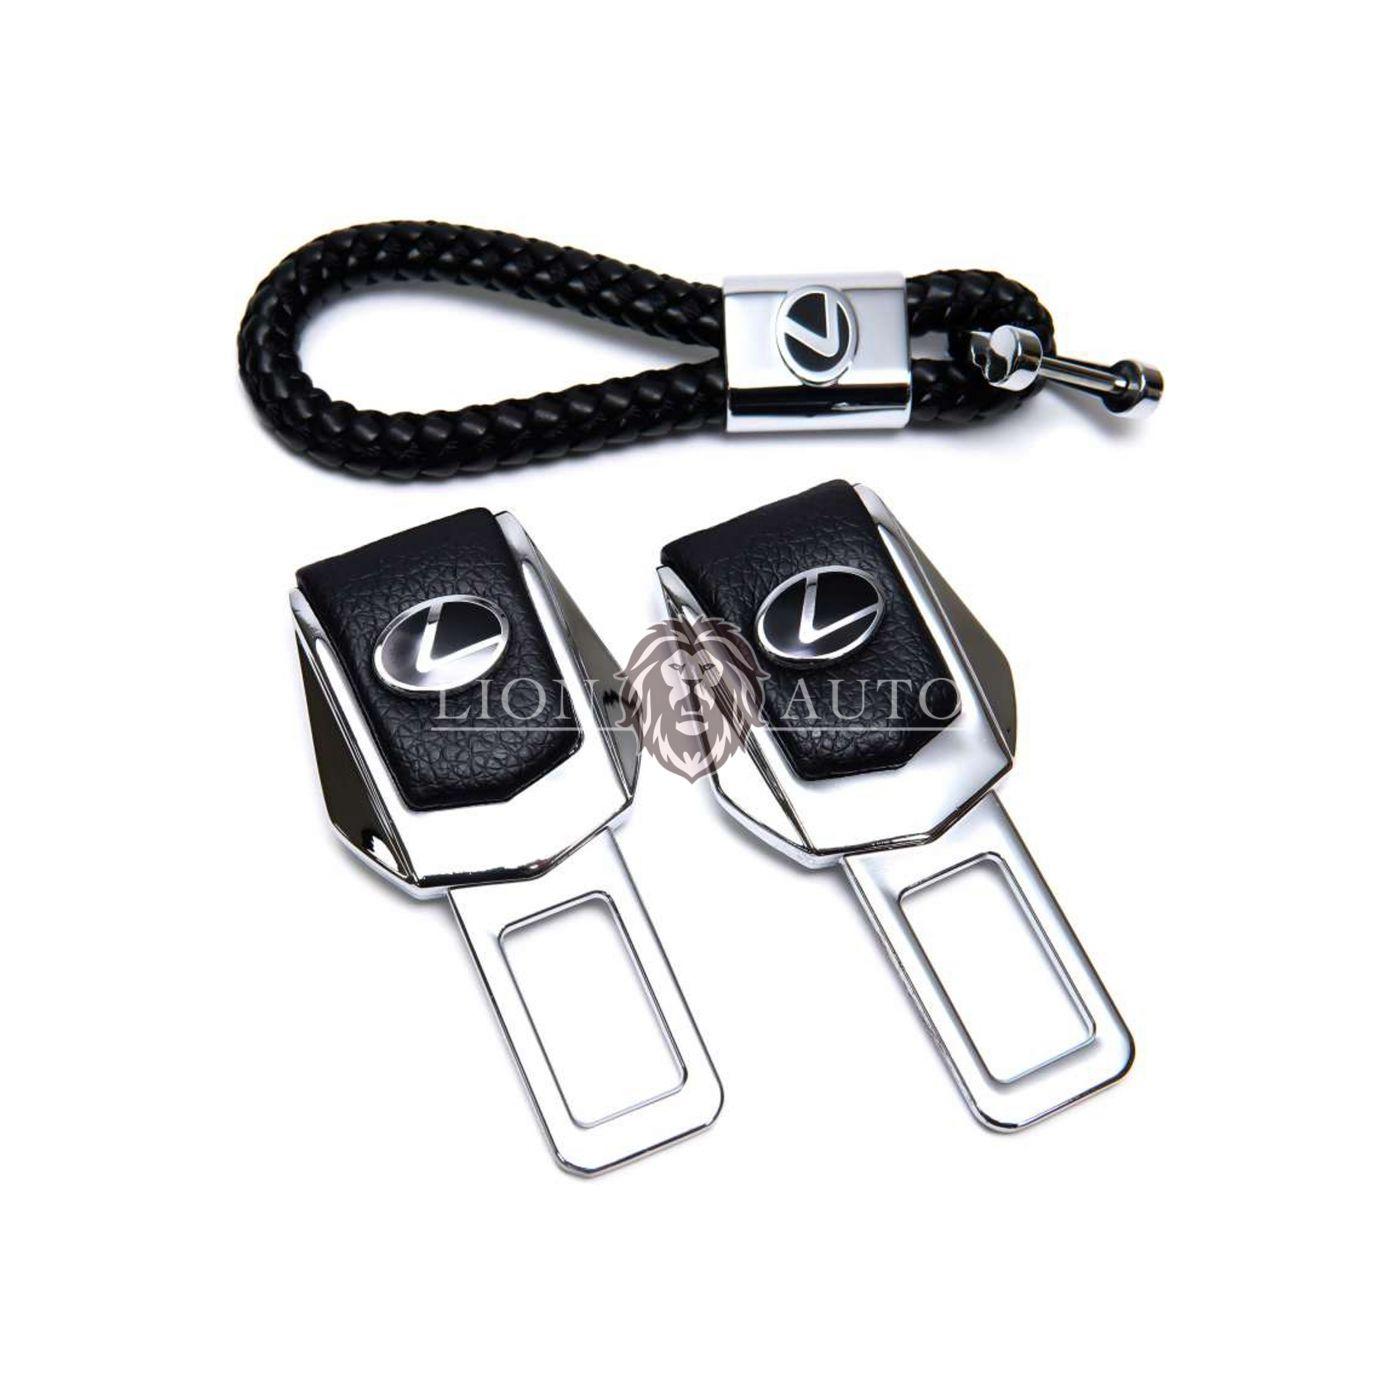 Заглушки ремня безопасности на Lexus (набор)